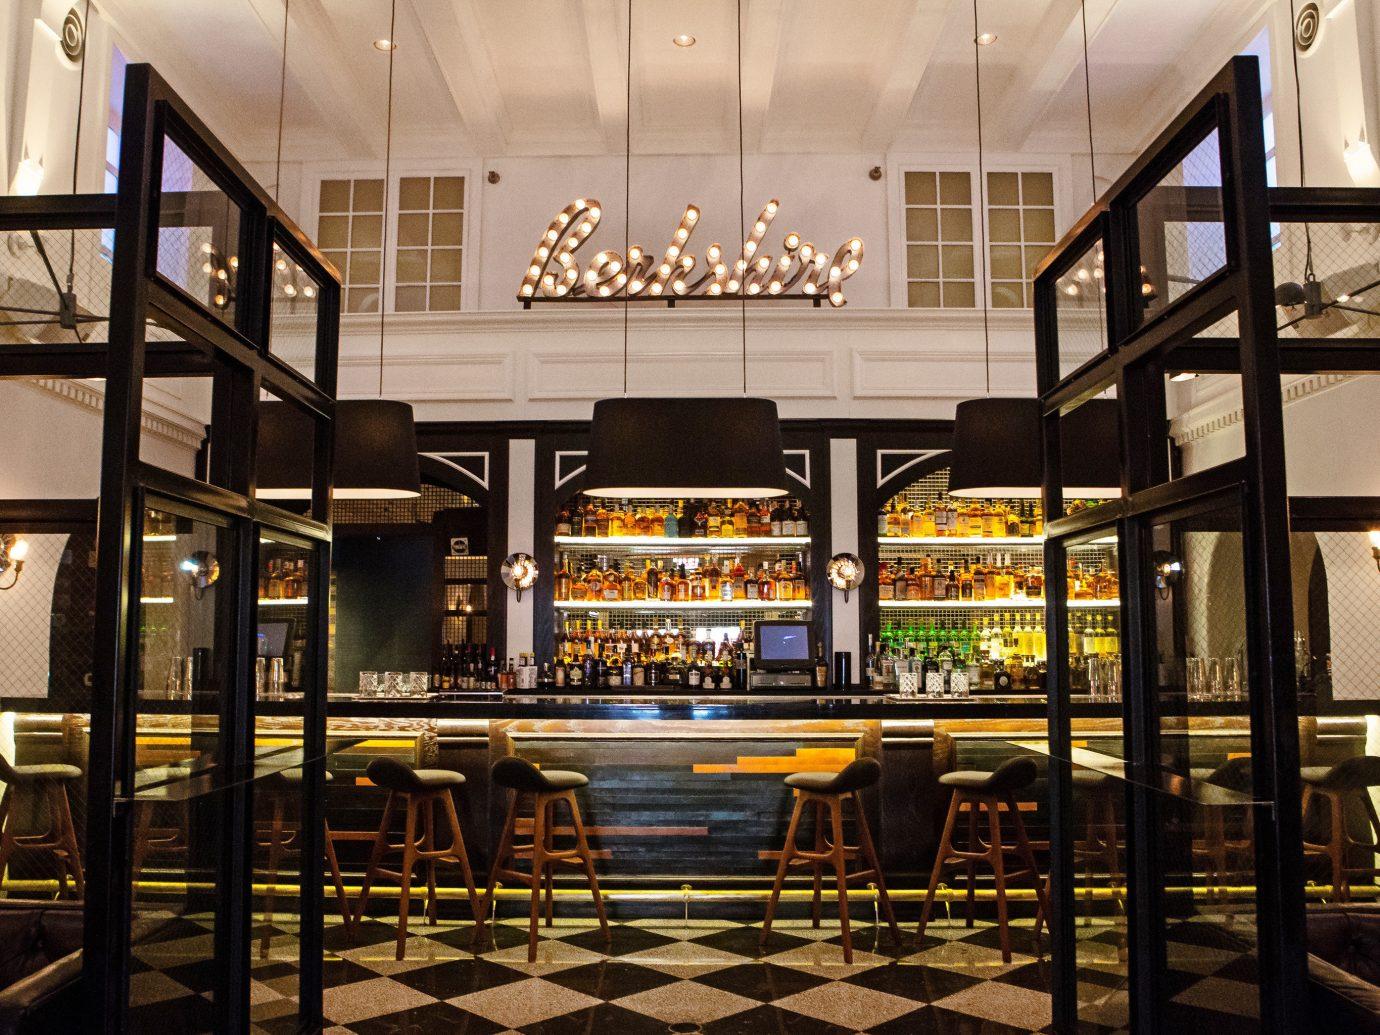 Budget Dining Hip Hotels Luxury Modern indoor restaurant interior design Bar lighting Lobby several